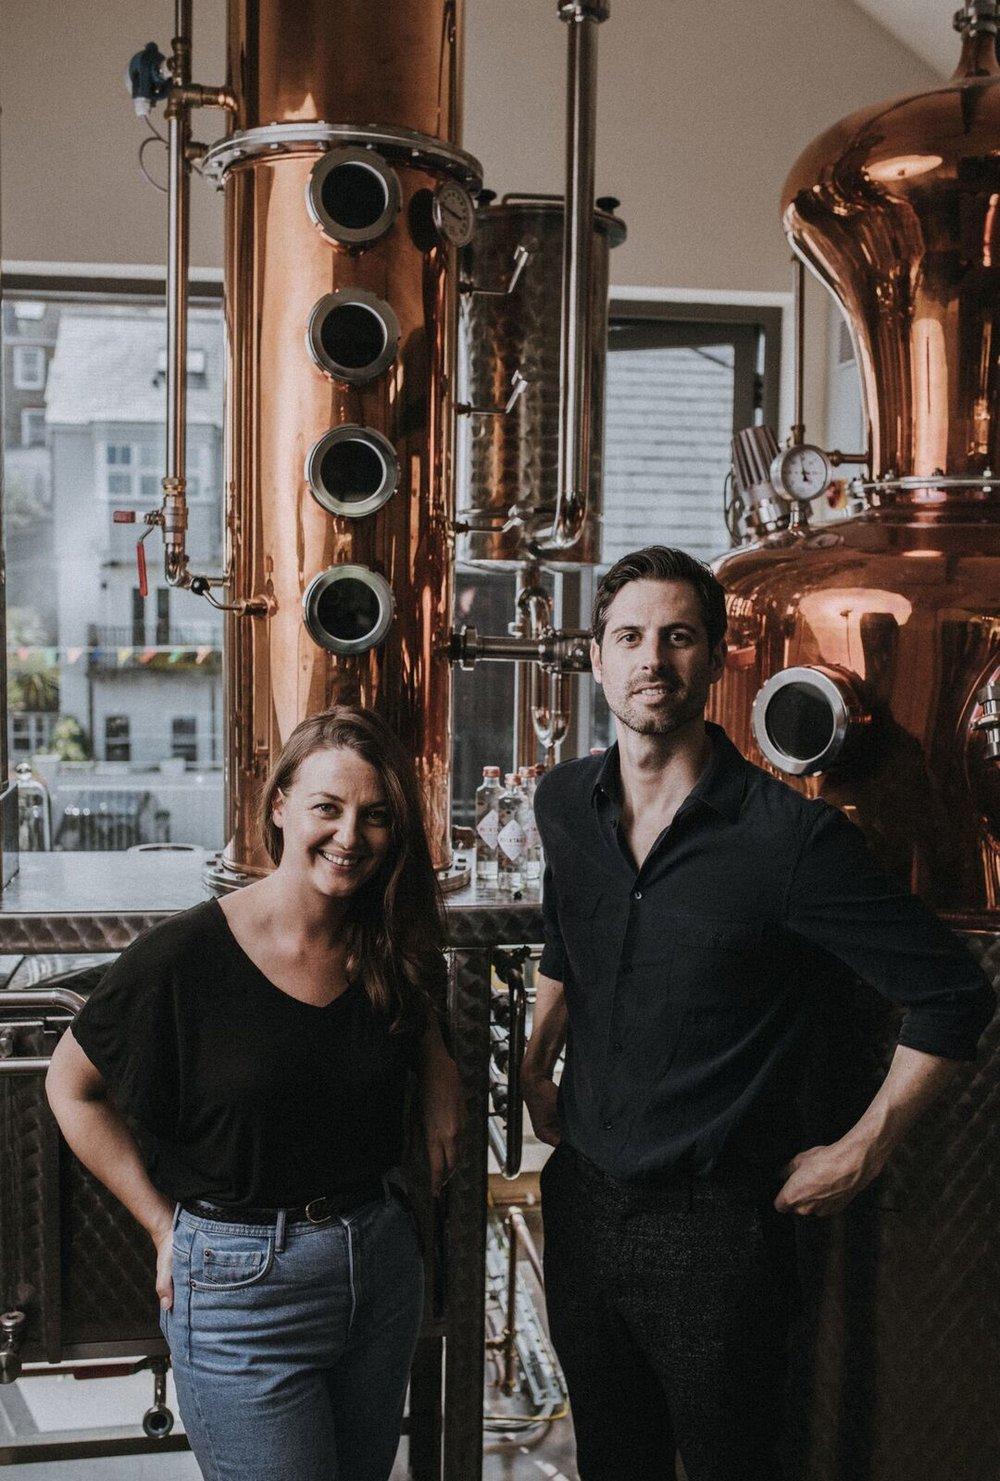 The Distillers - distill@rocktails.co.ukTel: 01364 73779Rocktails,17 Brent Mill, Long Meadow,Devon,TQ10 9YT